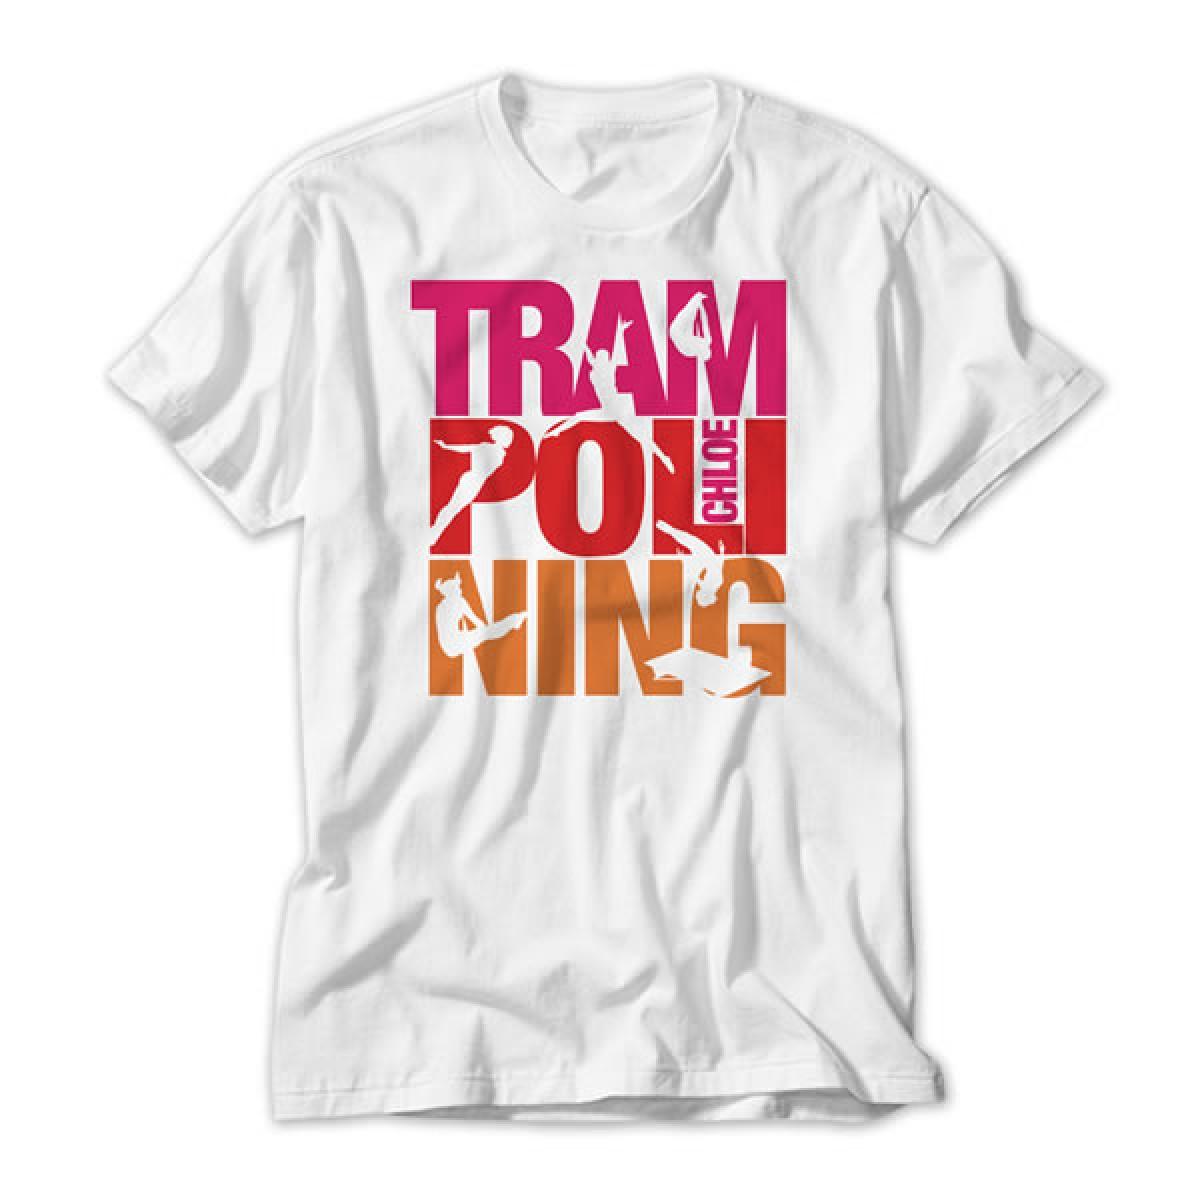 Design t shirt kid - Design T Shirt Kid 47